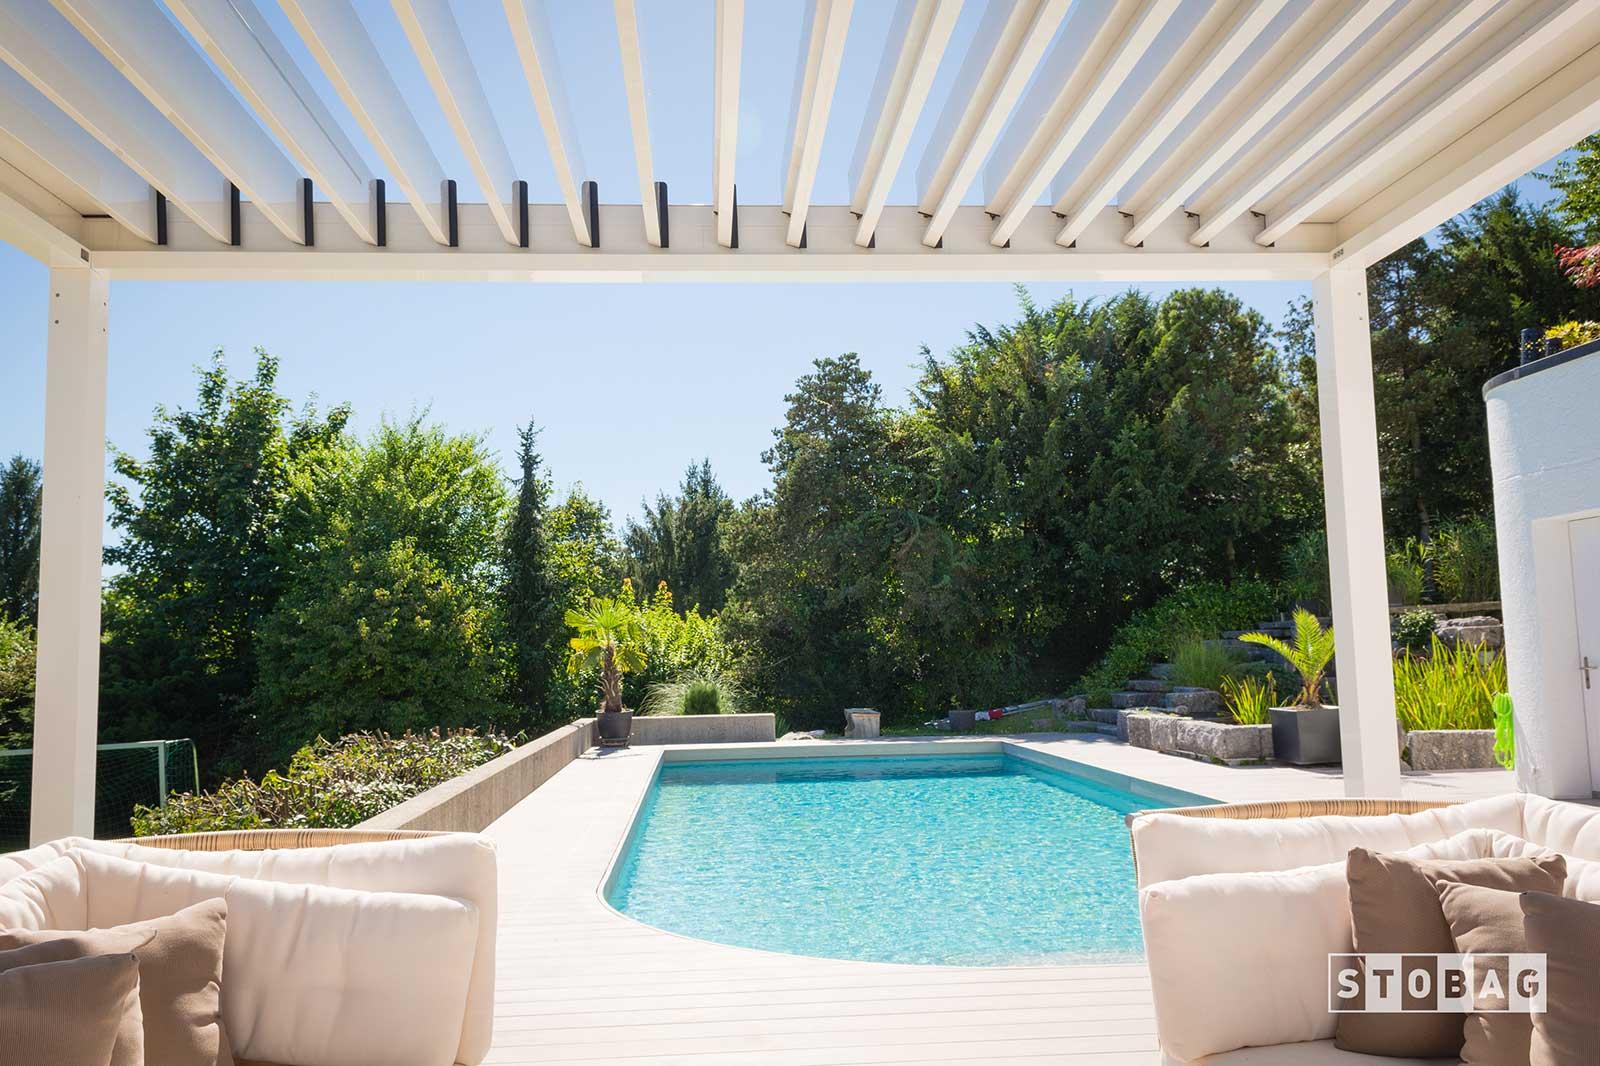 Aménagement terrasse piscine Yverdon Vaud